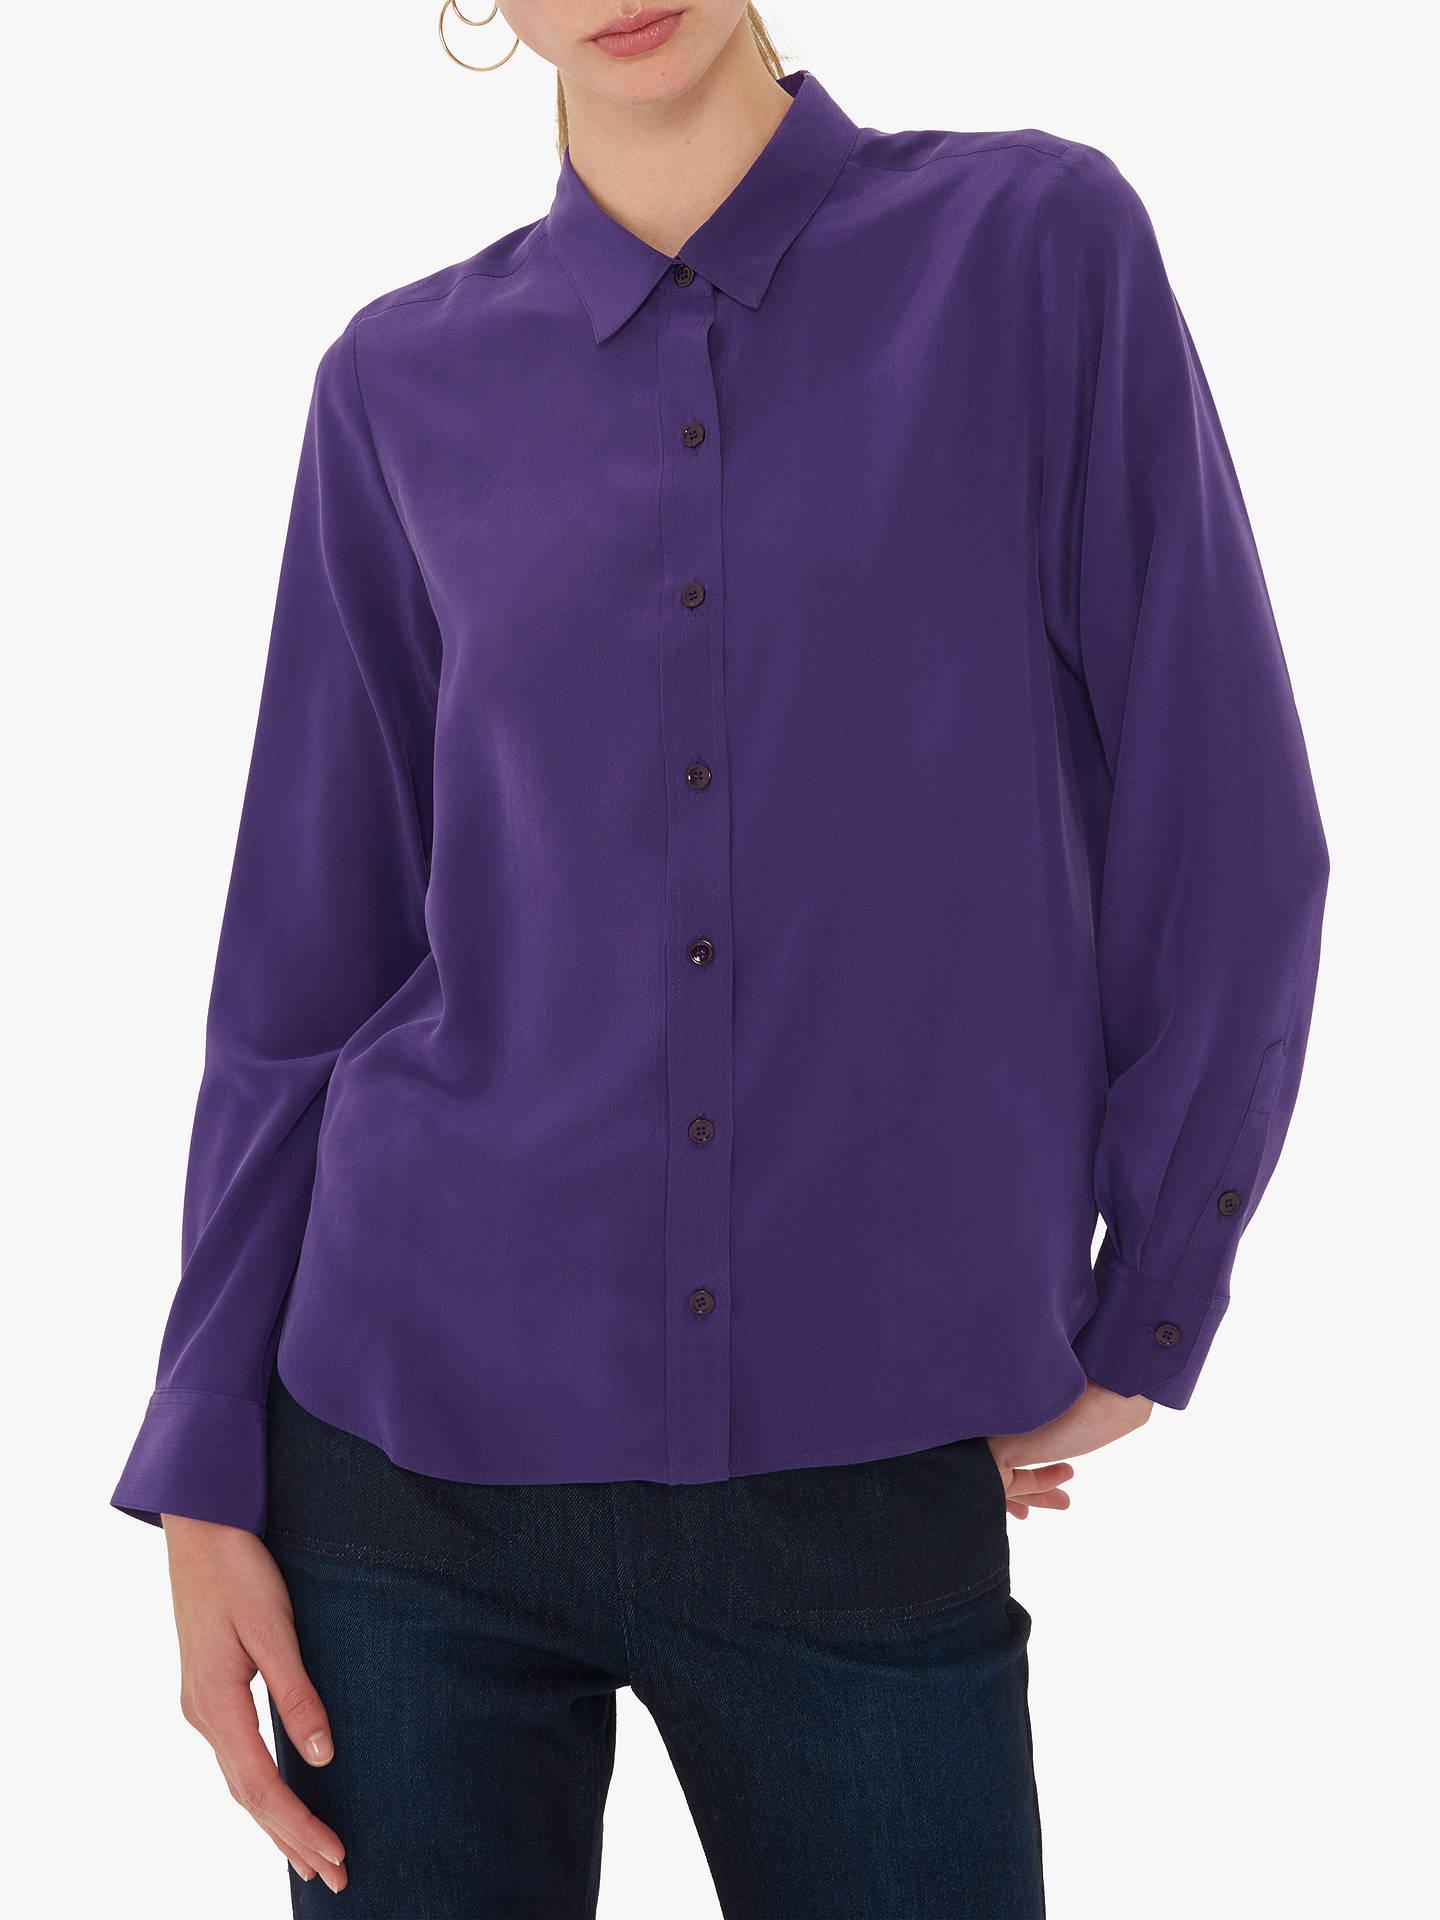 4ea05061692a92 Buy Gerard Darel Lila Silk Blouse, Purple, 6 Online at johnlewis.com ...